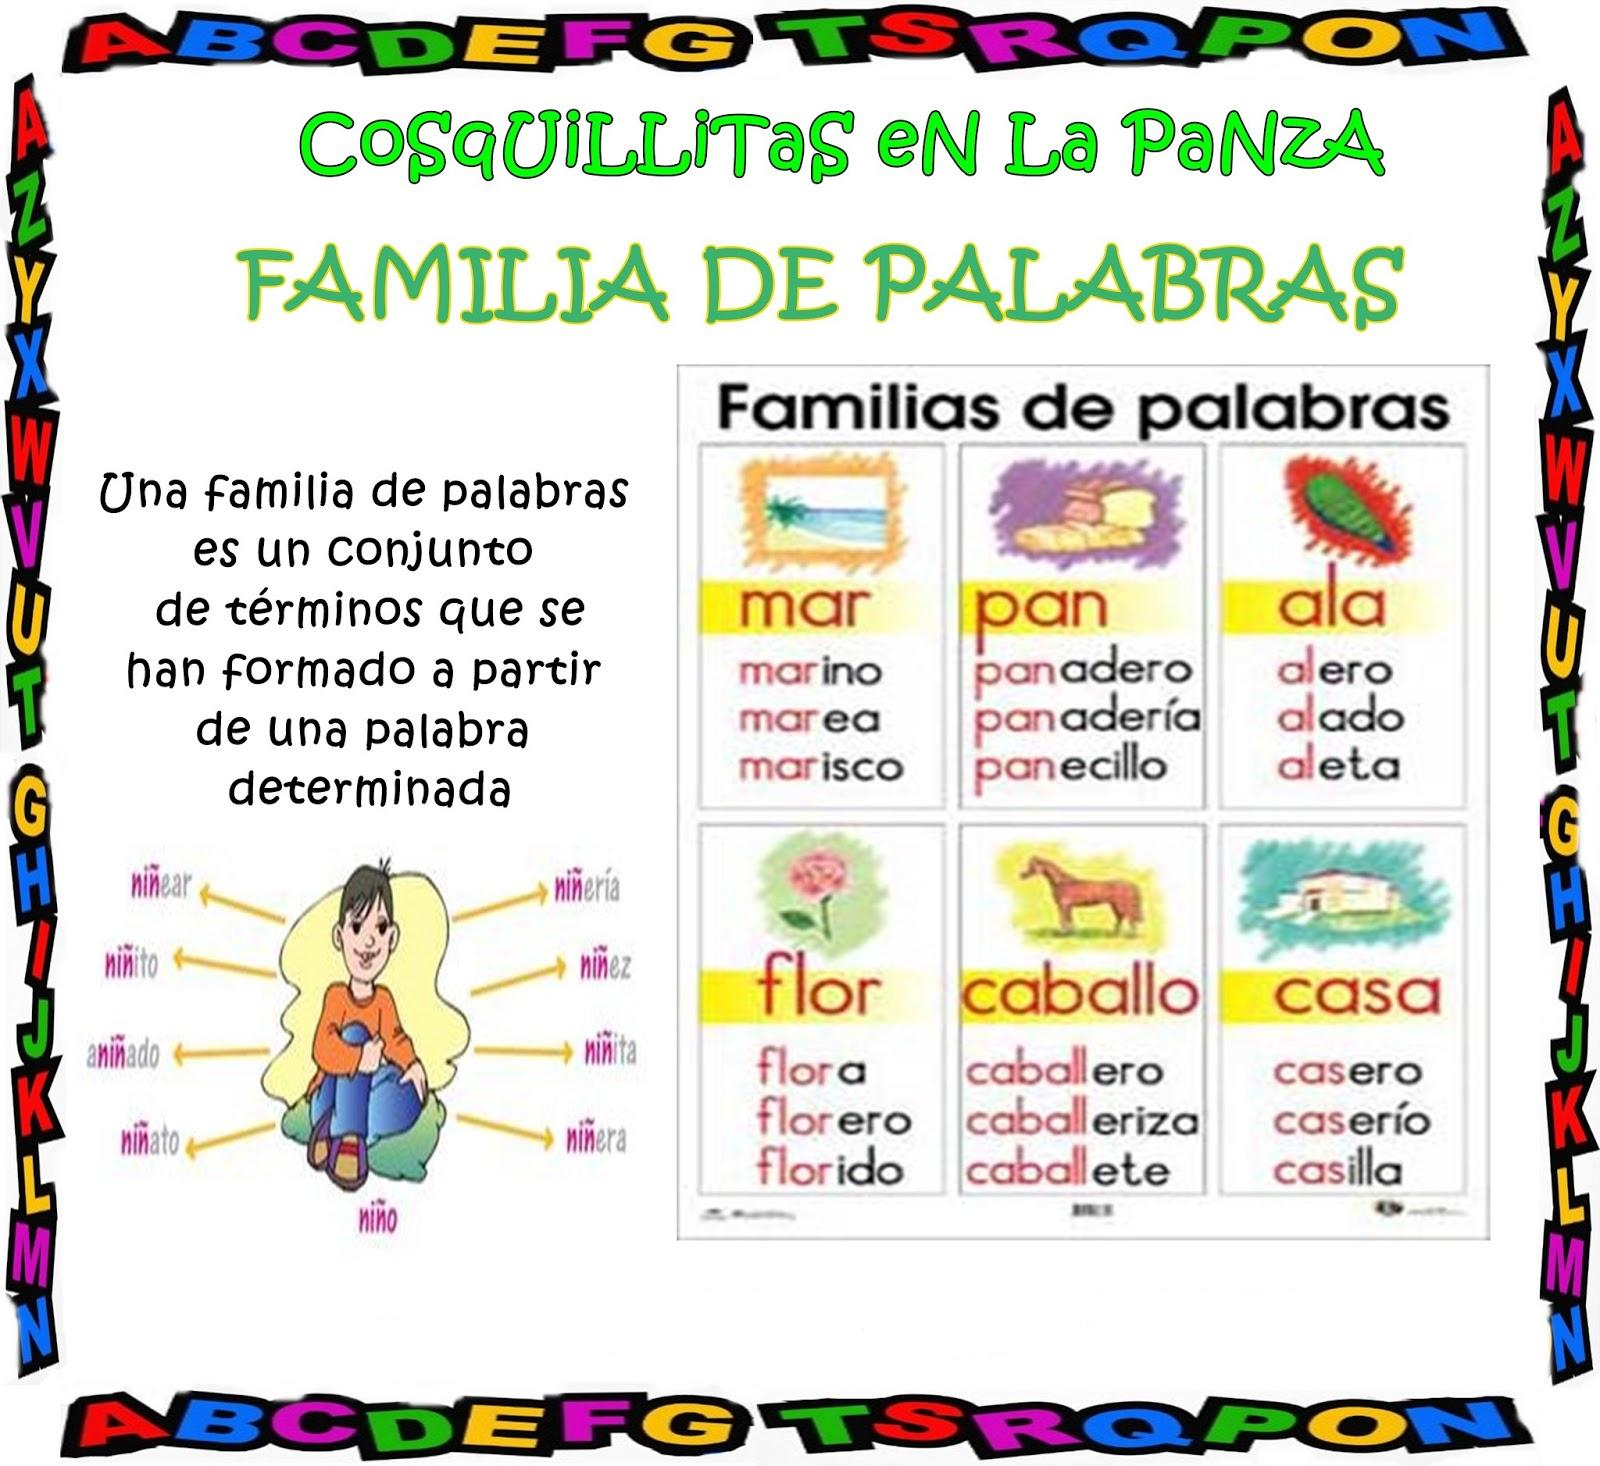 Maestro san blas familia de palabras for Concepto de familia pdf